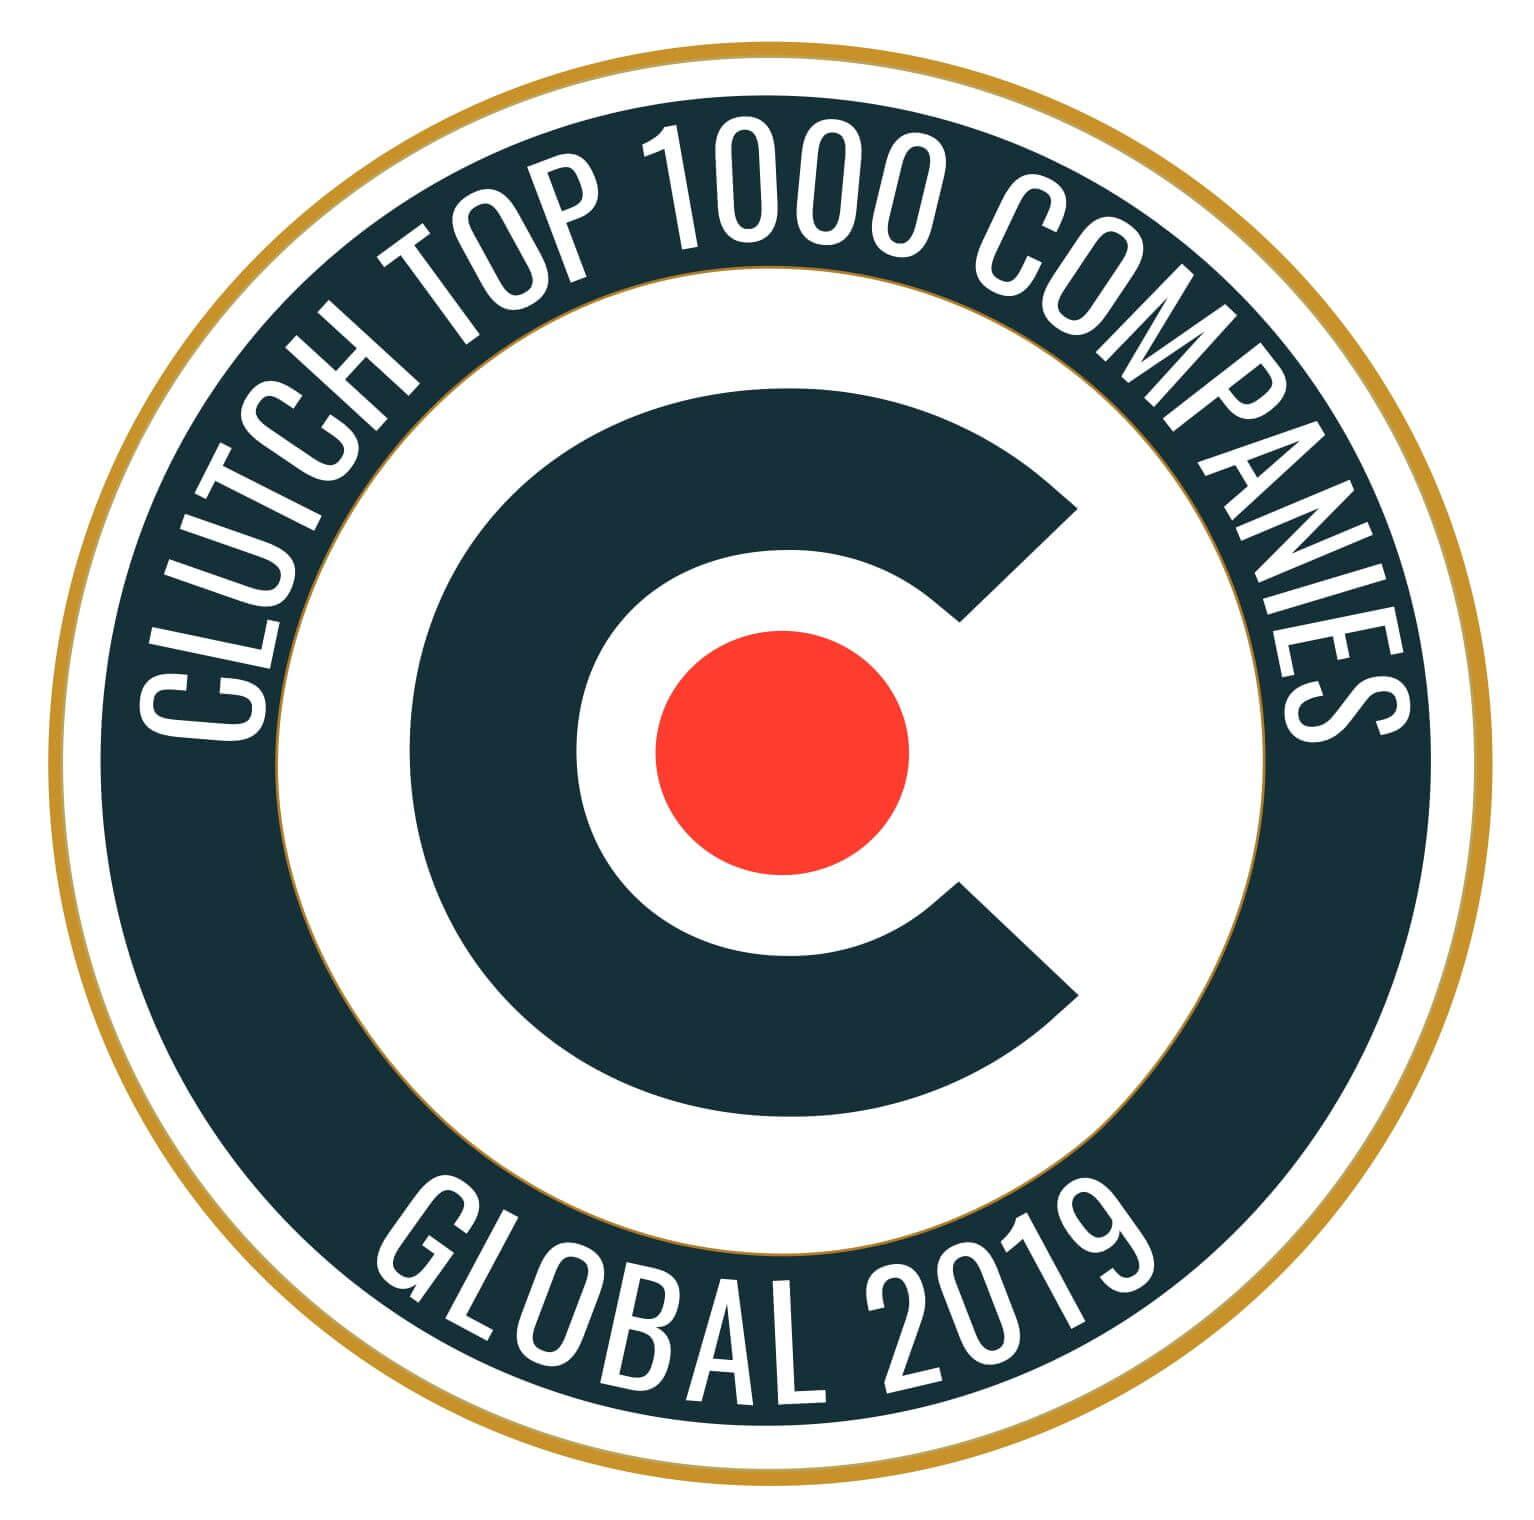 Clutch Global top 1000 companies